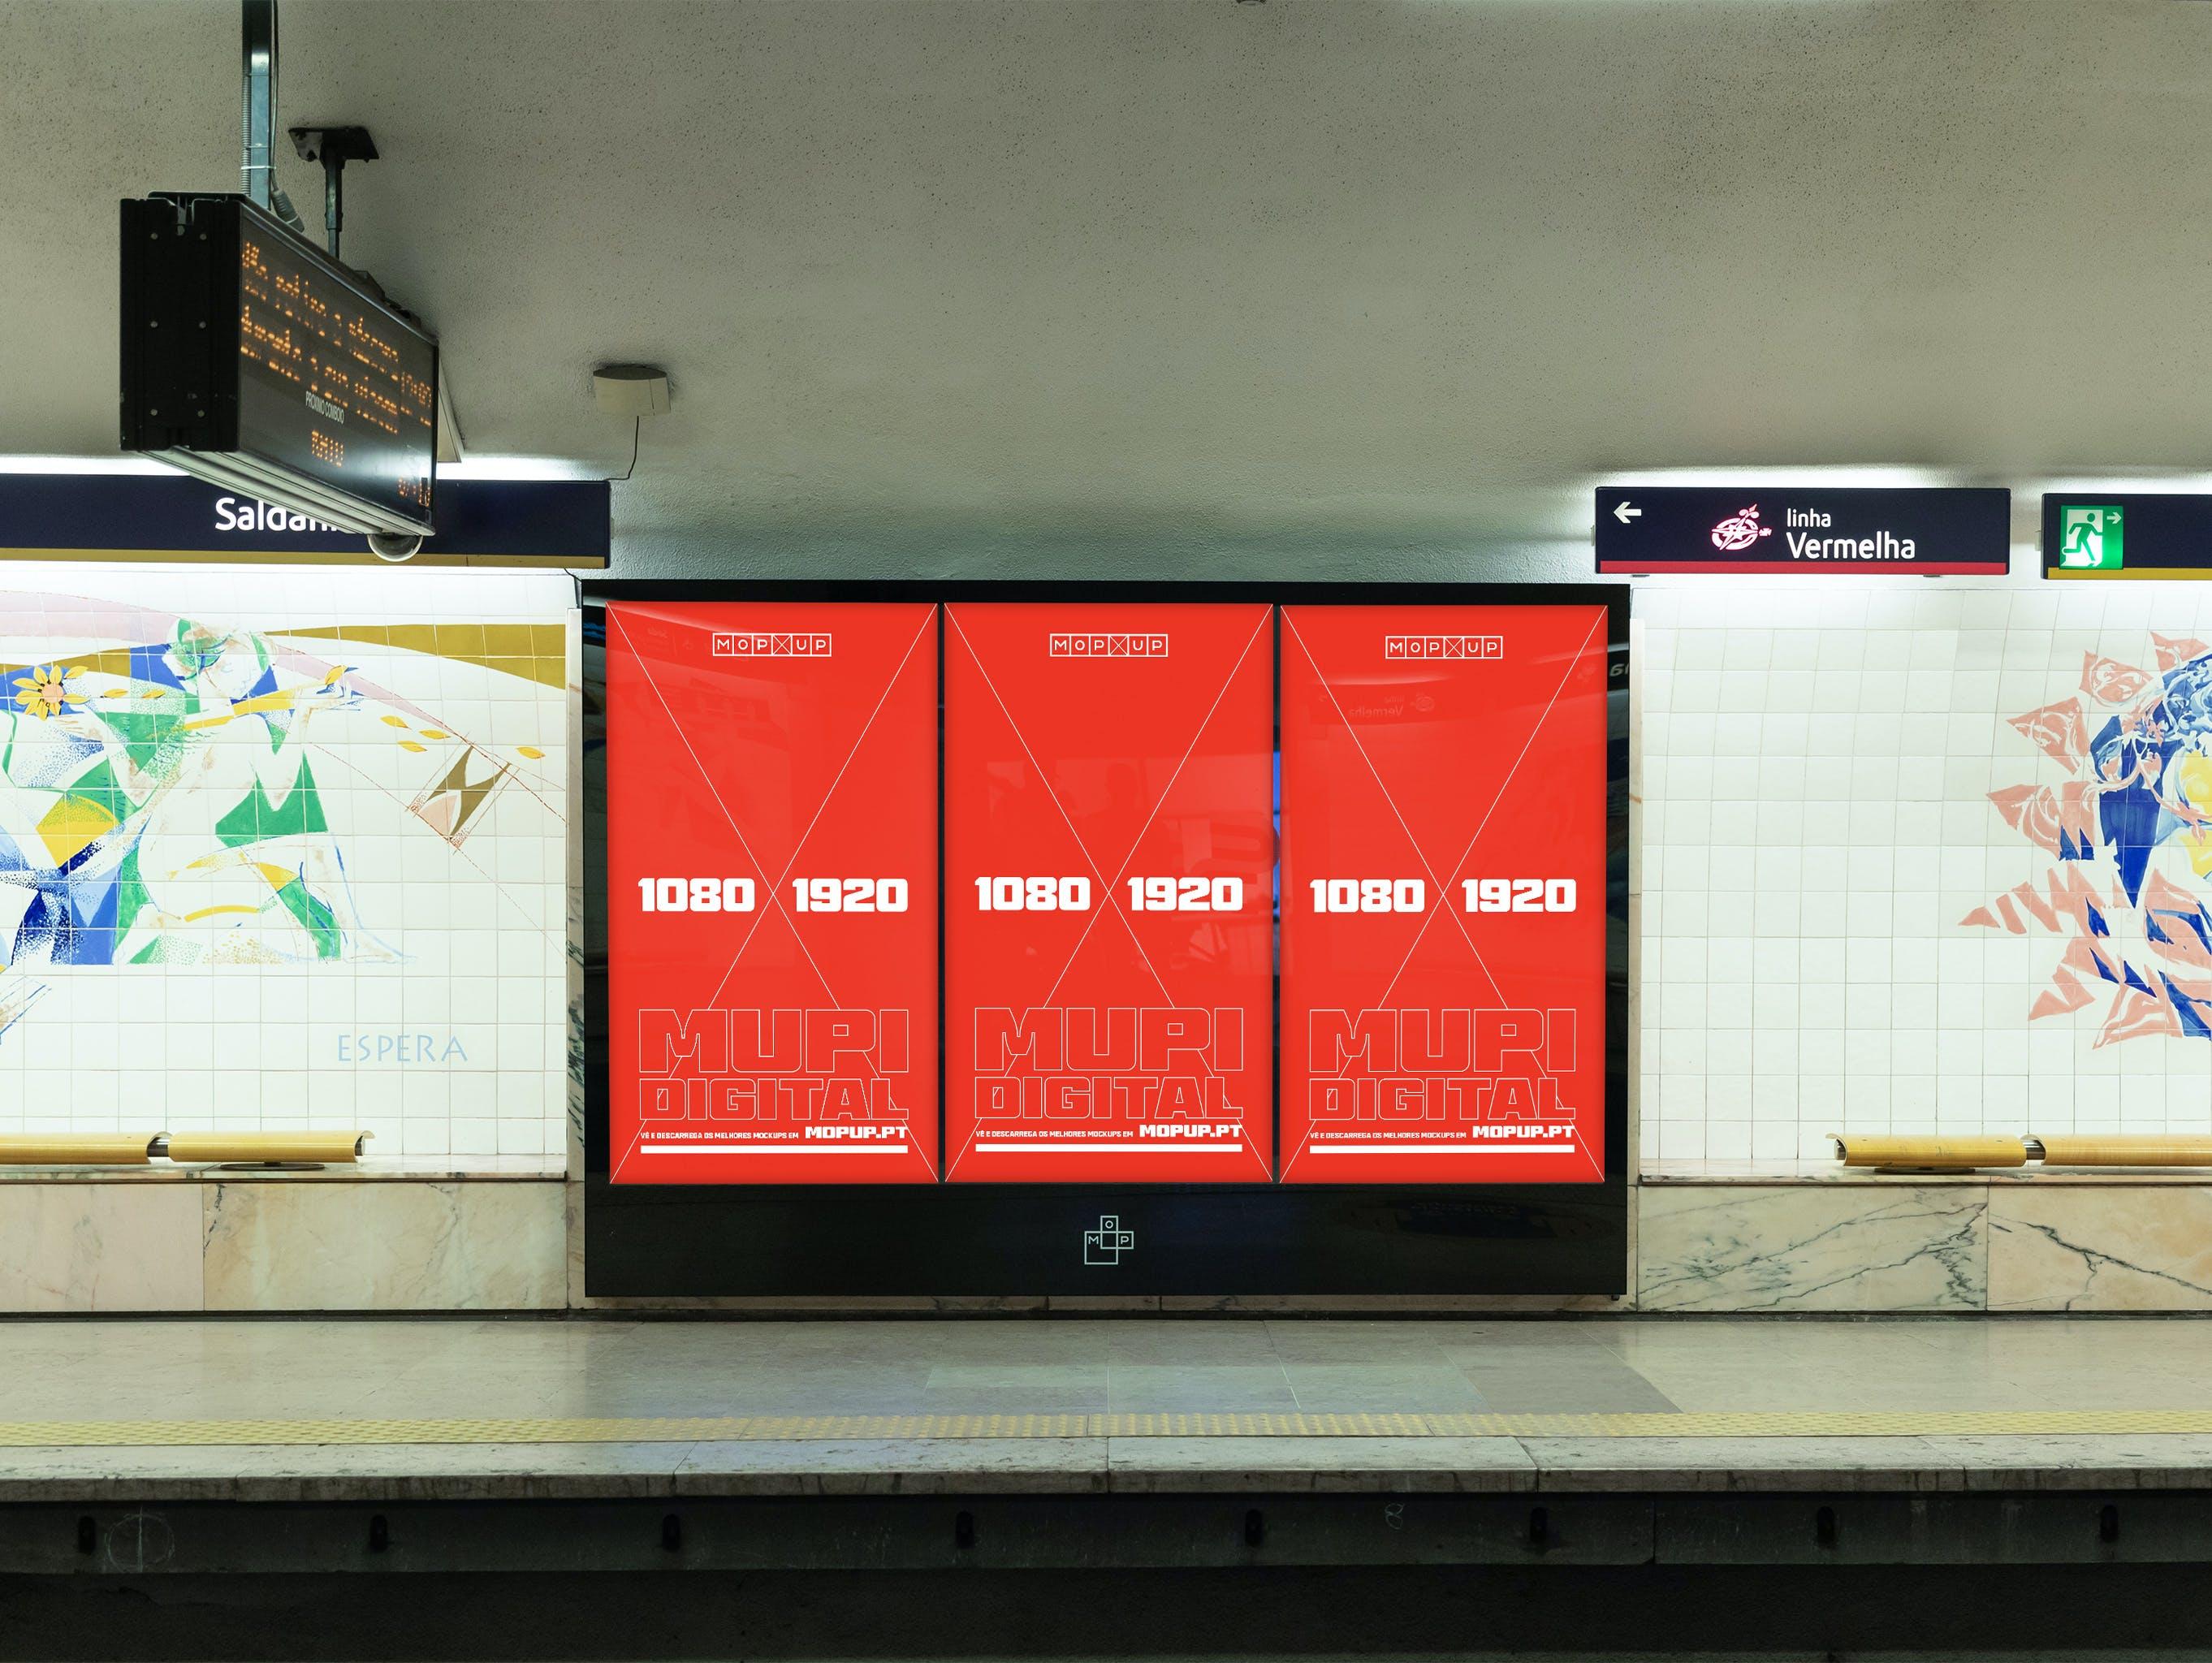 MOPUP - Mupi Digital Metro da Alameda - Mockup